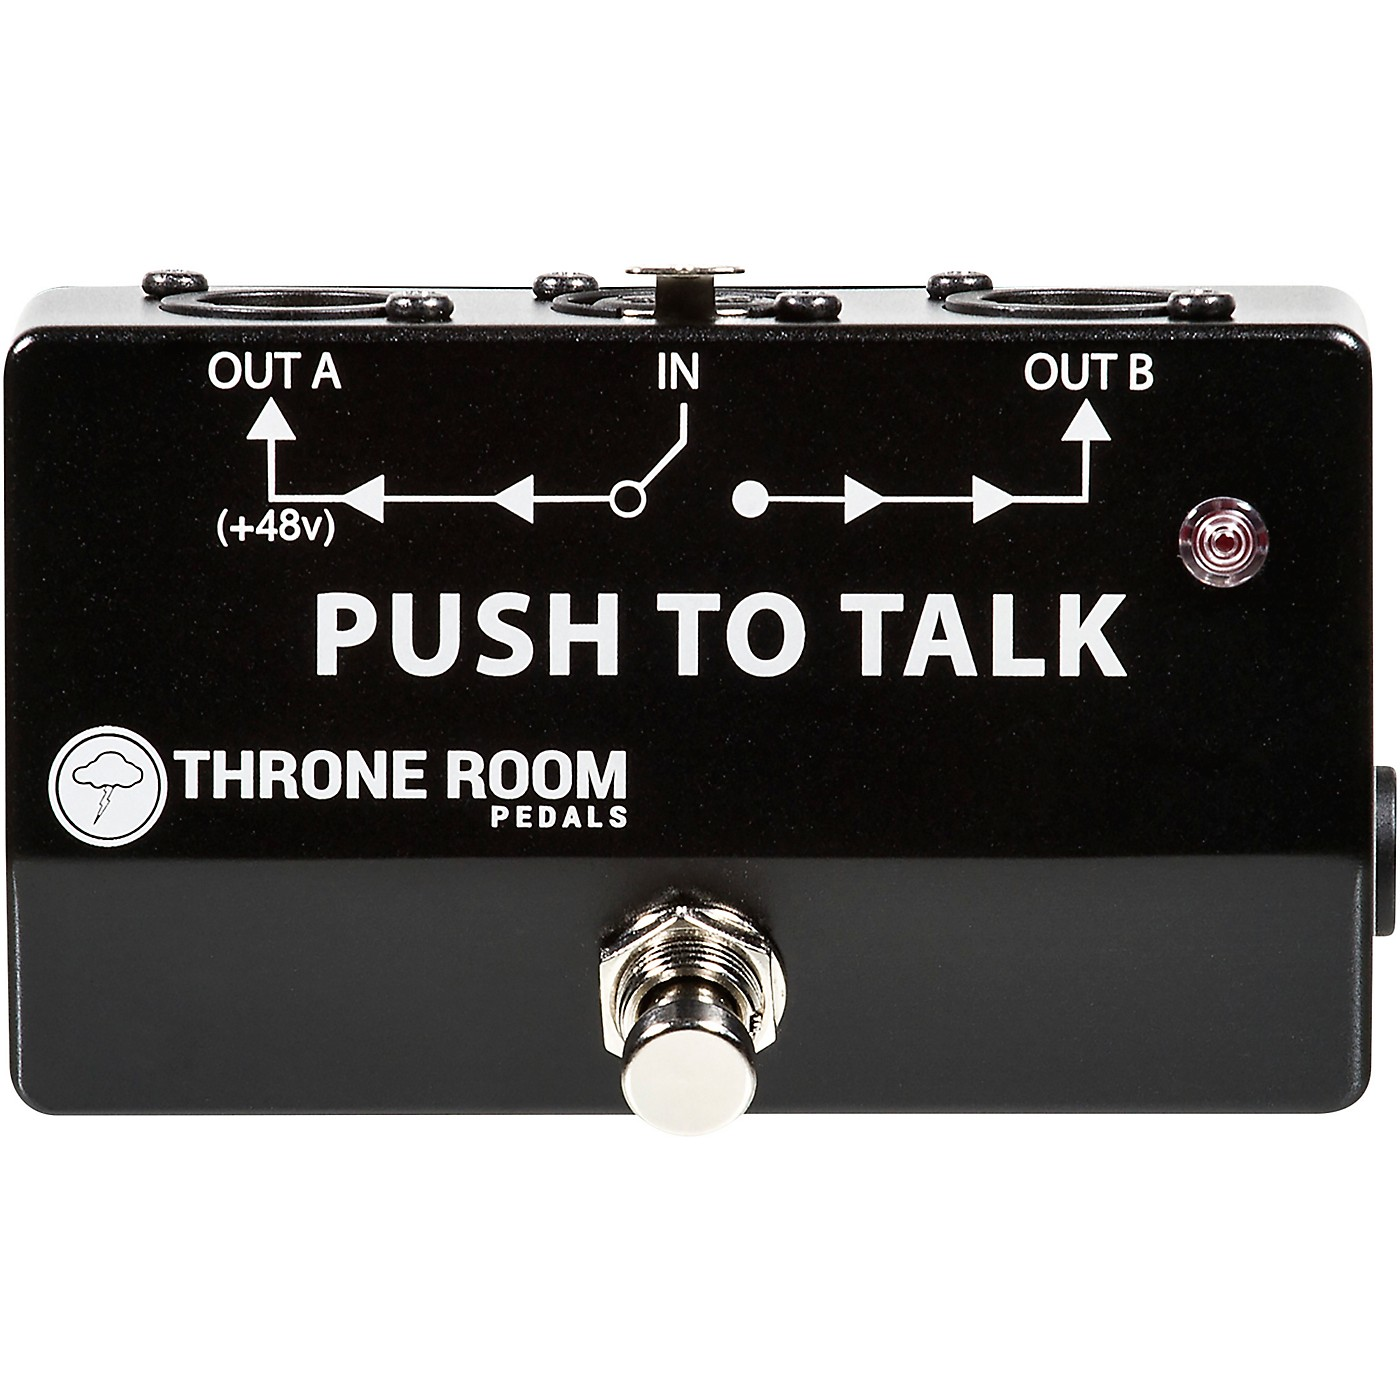 Throne Room Pedals Push To Talk Box Momentary XLR A/B Switcher thumbnail